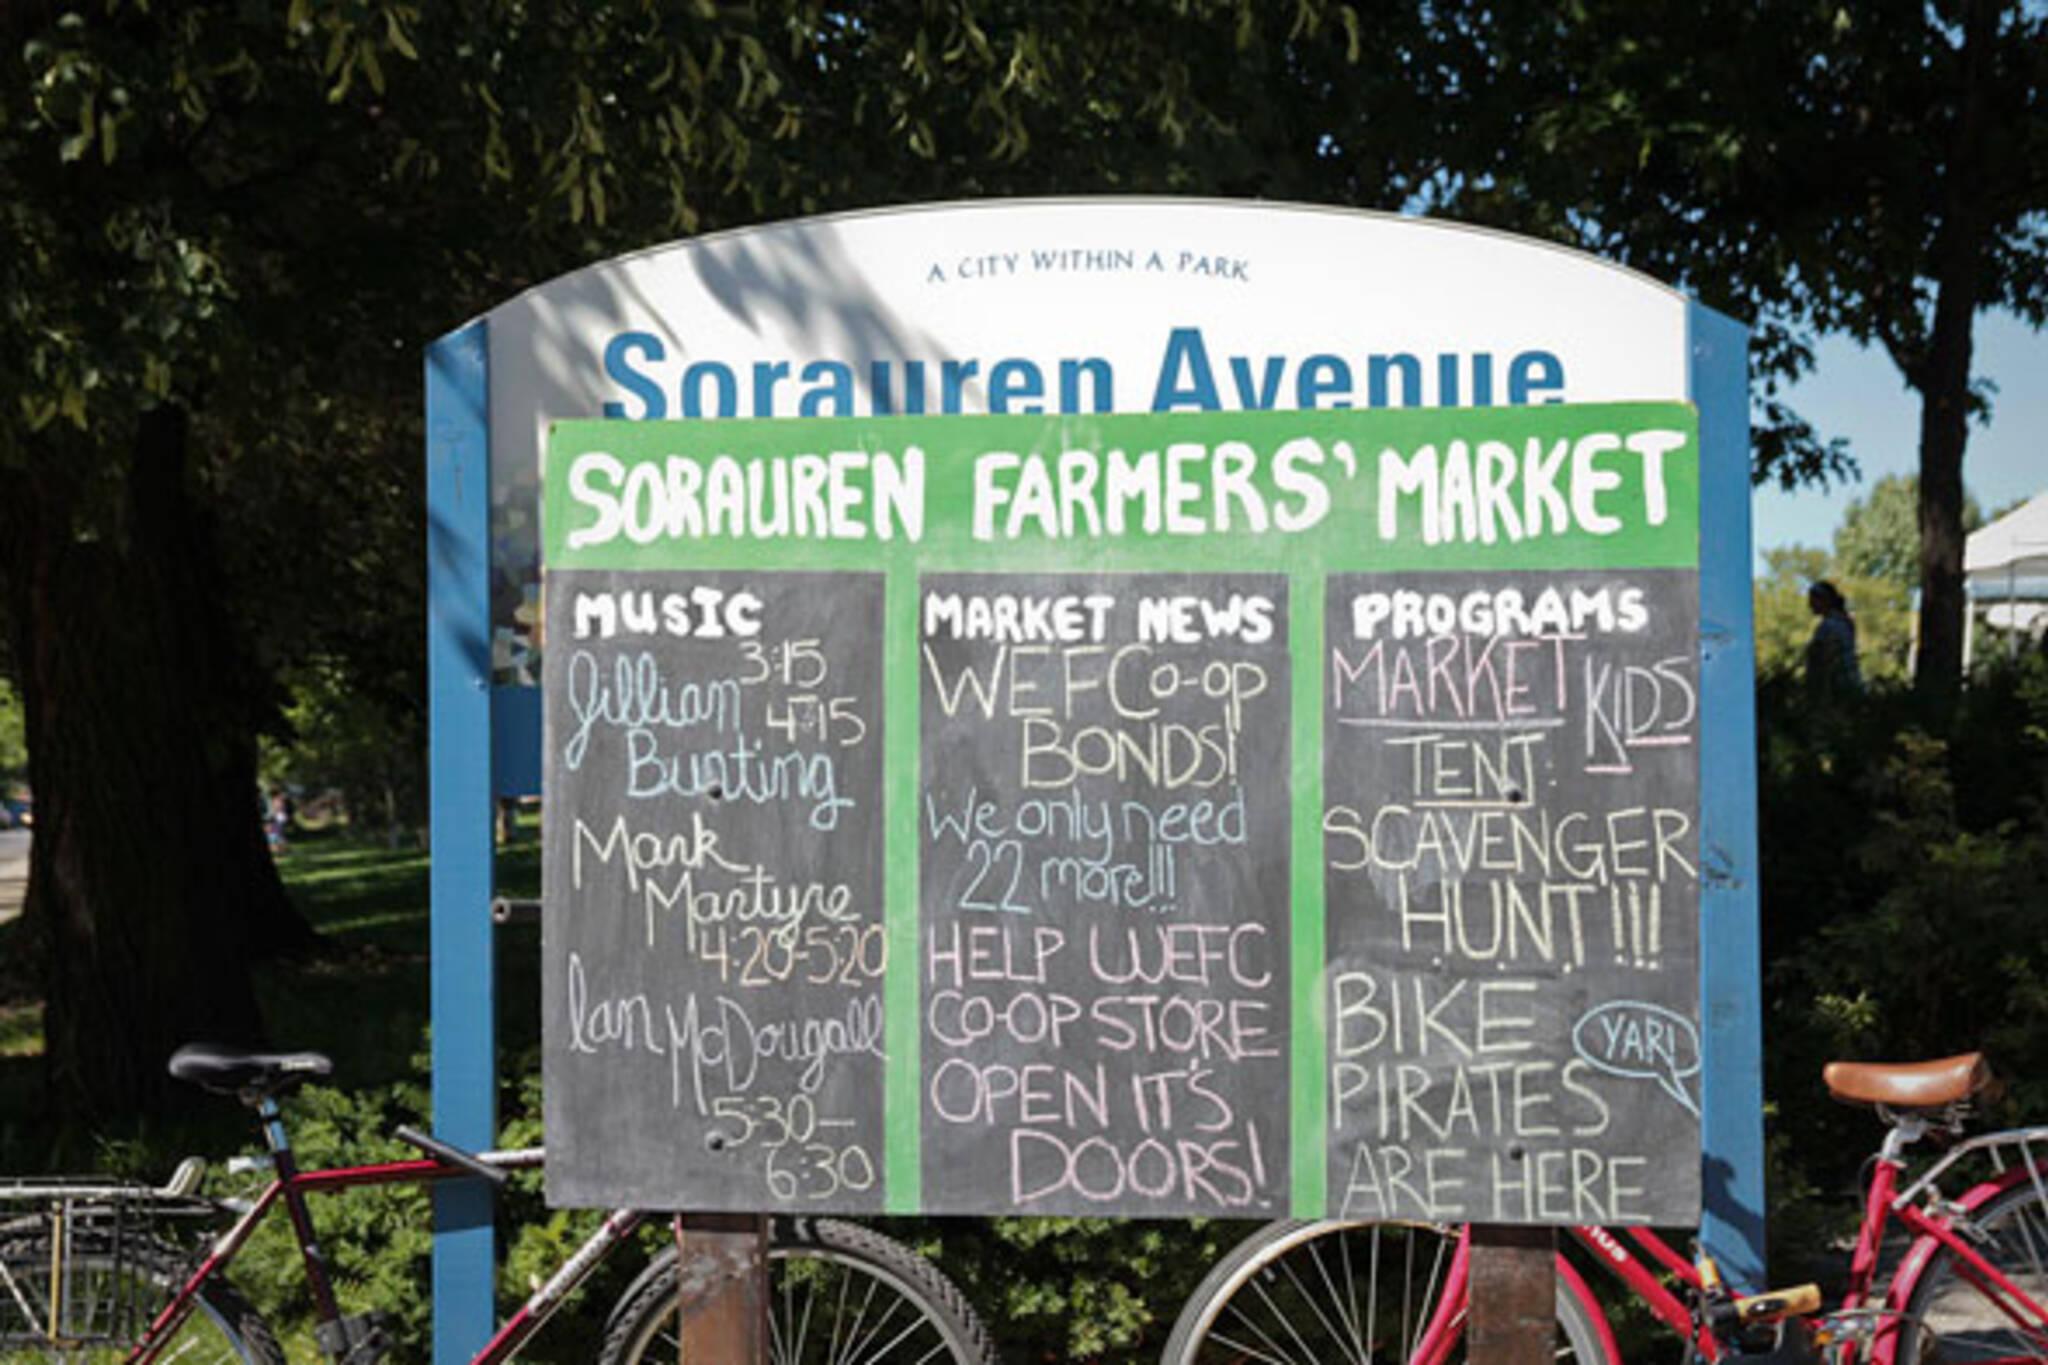 sorauren farmer's market toronto